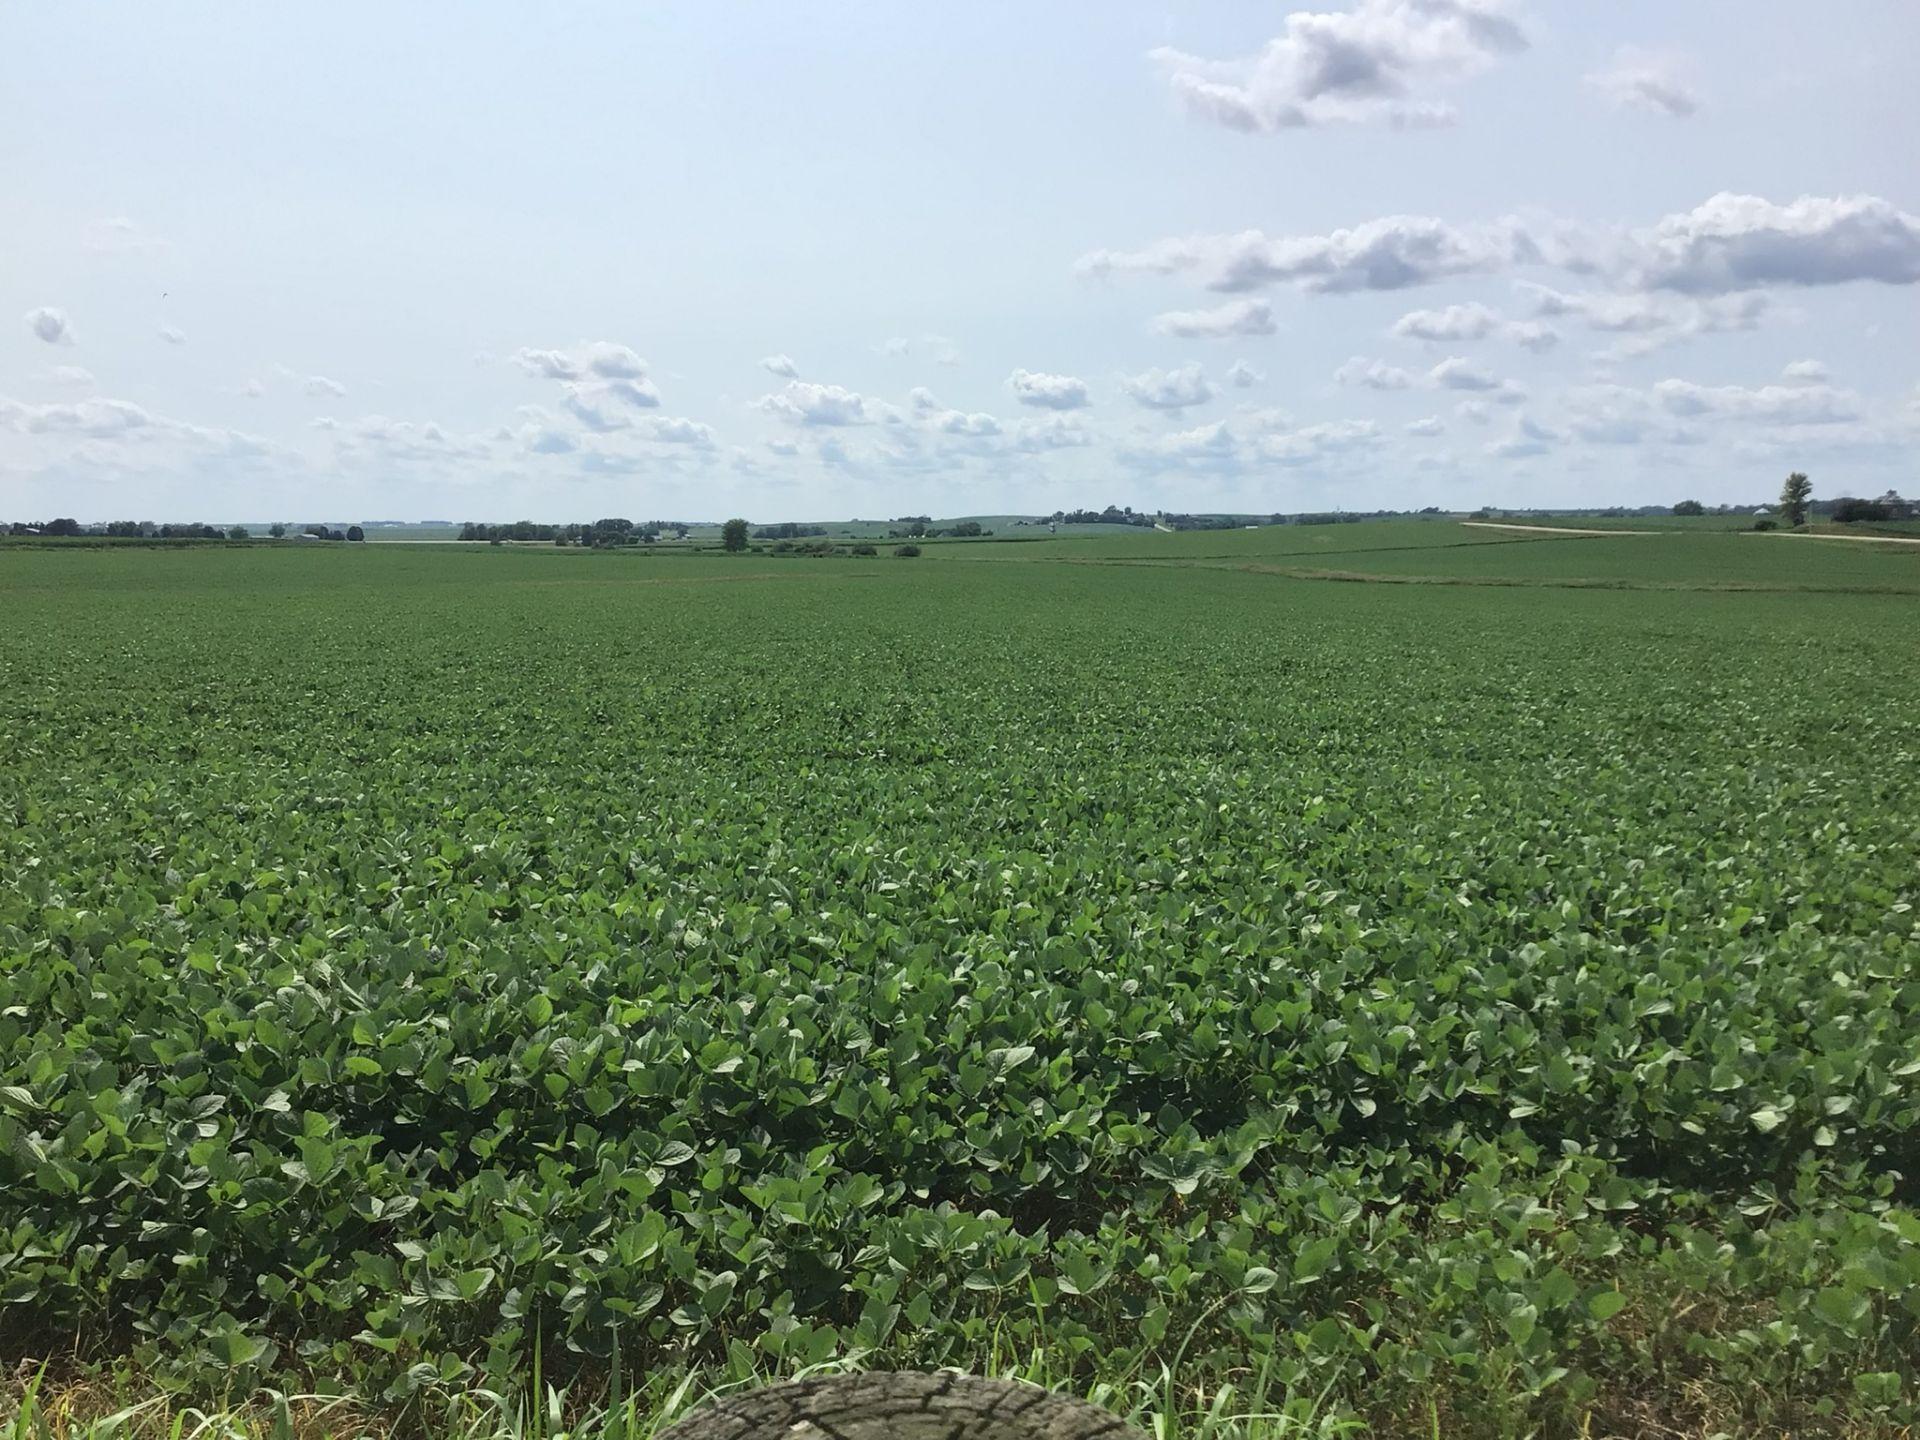 Clinton County 91 Acres M/L - Image 4 of 9